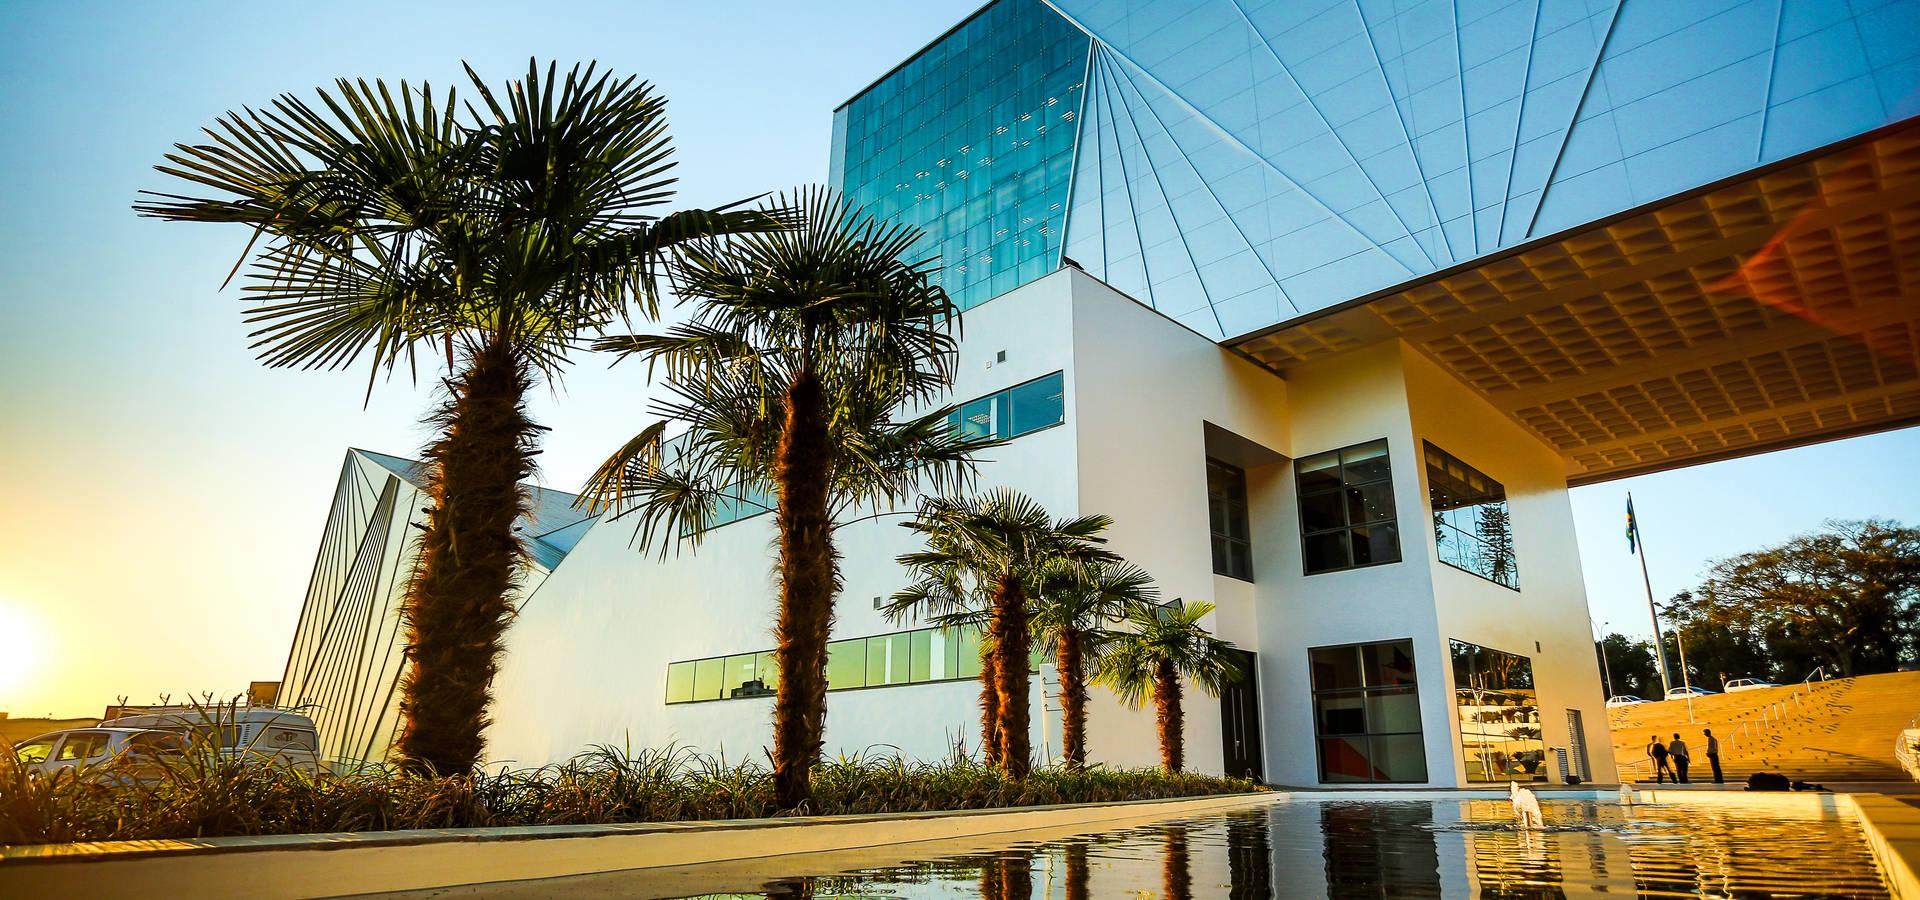 Tartan Arquitetura e Urbanismo